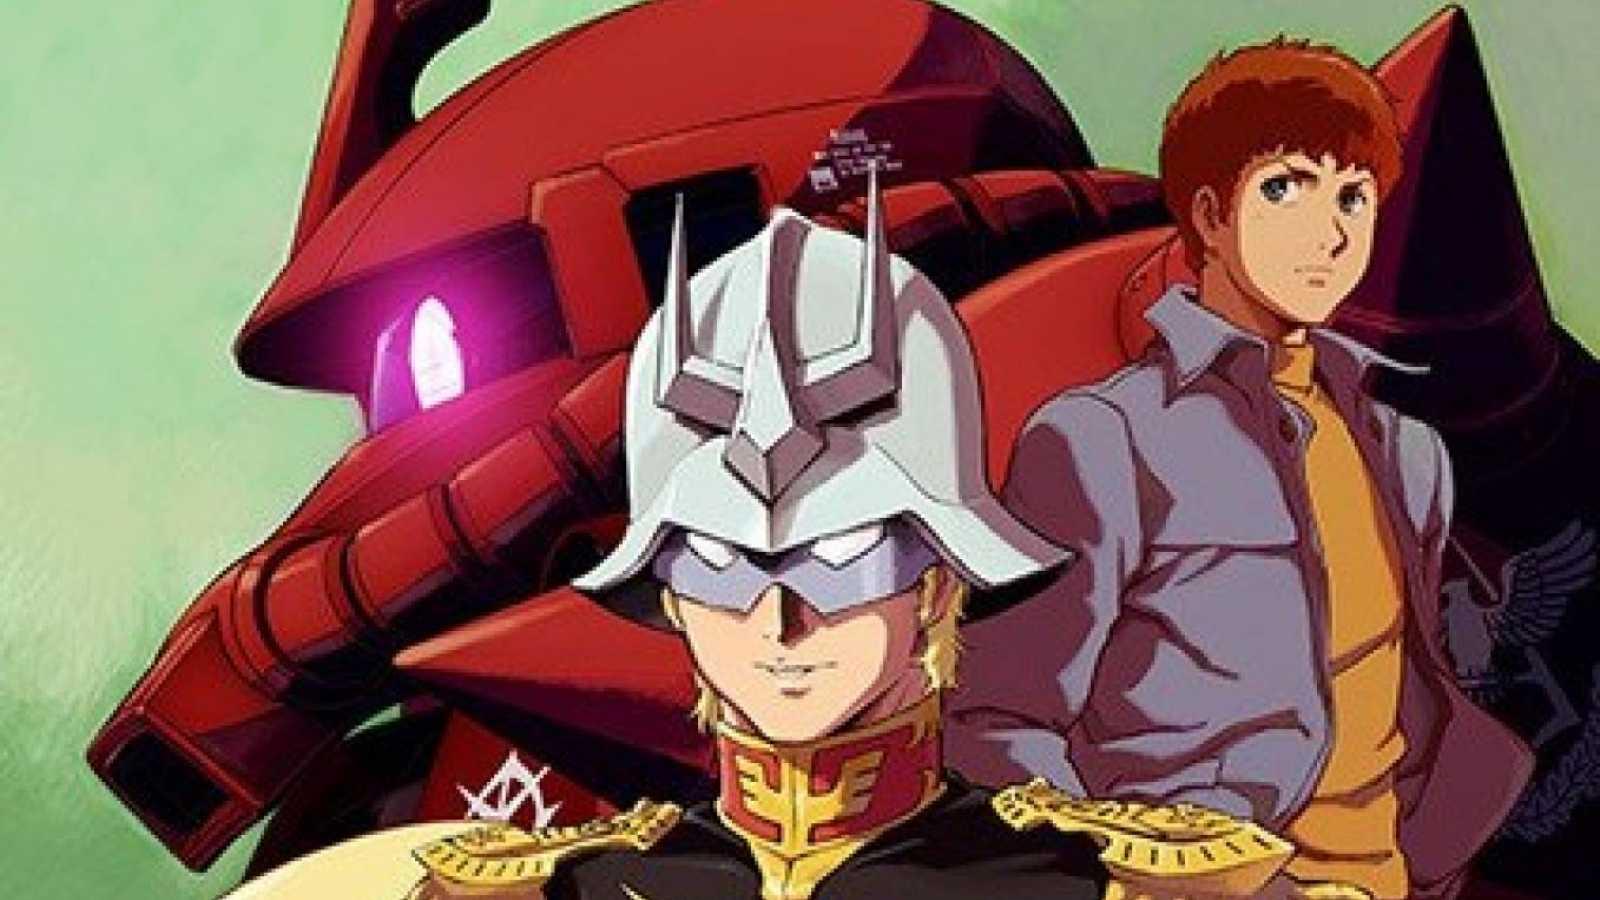 LUNA SEA et SUGIZO de retour pour Gundam © All Rights Reserved